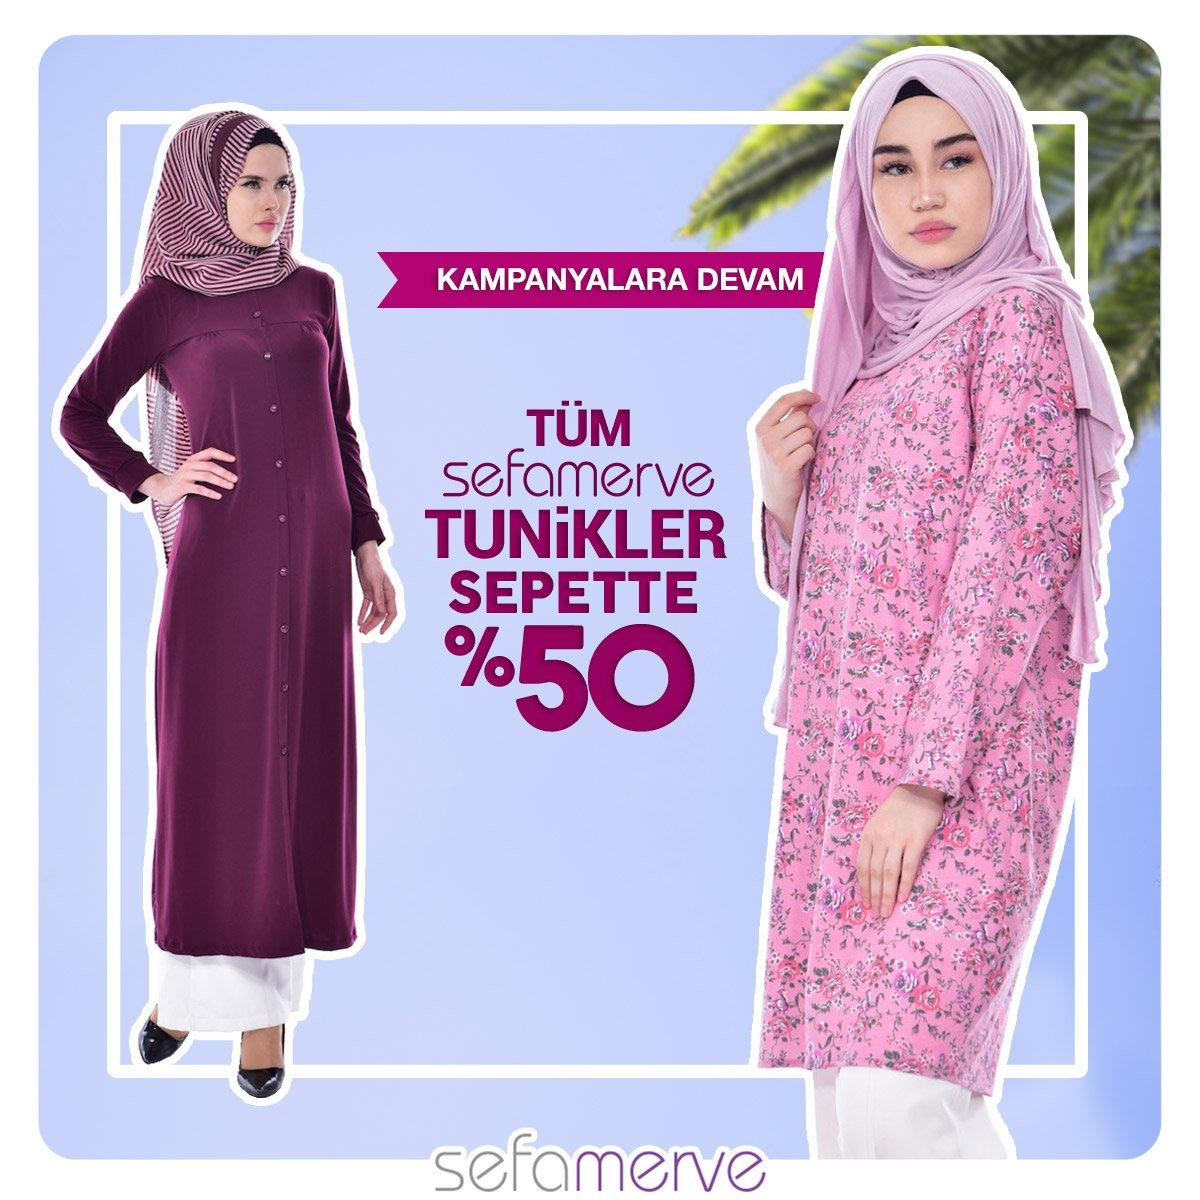 97ea93415edbf Sipariş Hattı : 0850 221 3040 #sefamerve#yasamtarzı#tesetturgiyim#hijabfashion#wrap#instafashion#muslim#hijabers#hijab#muslimwear#combination#clothing#sfm  ...